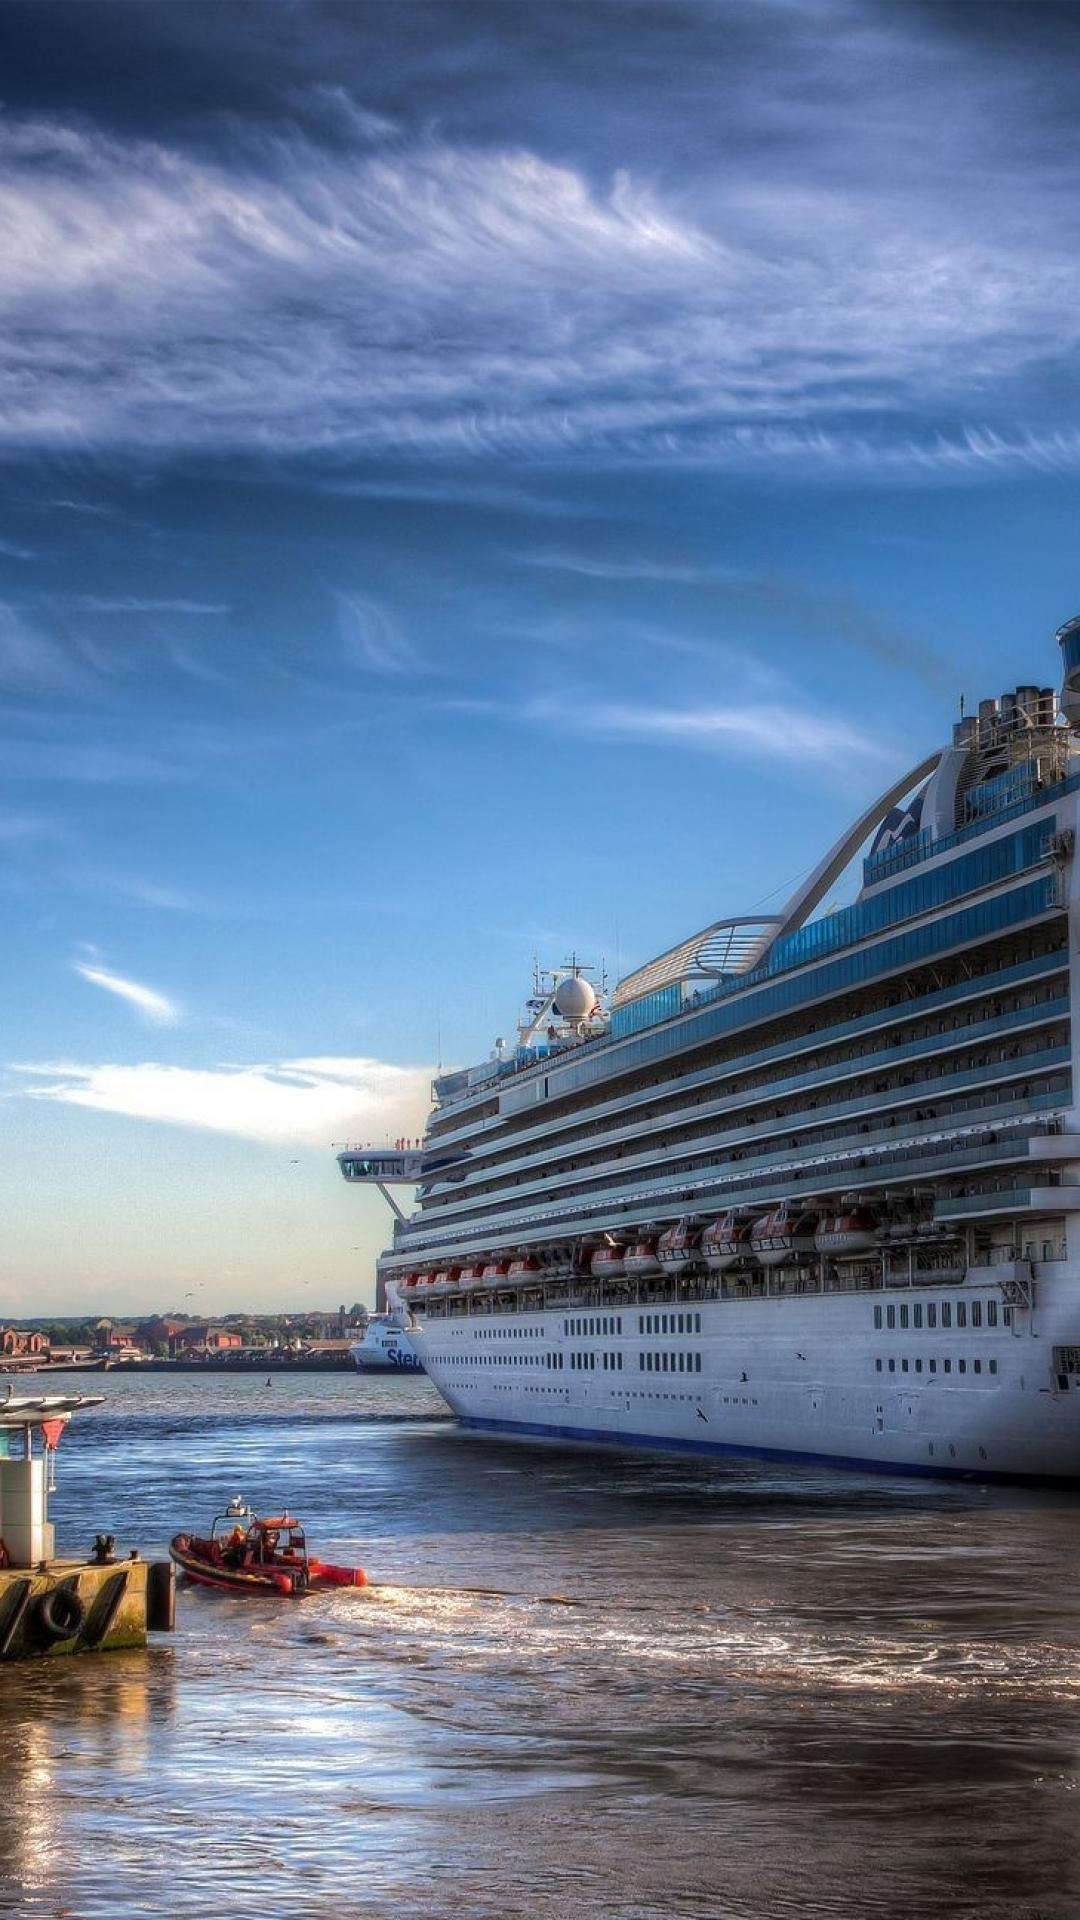 Cruise Ship Hd Wallpapers: Princess Cruises Wallpaper